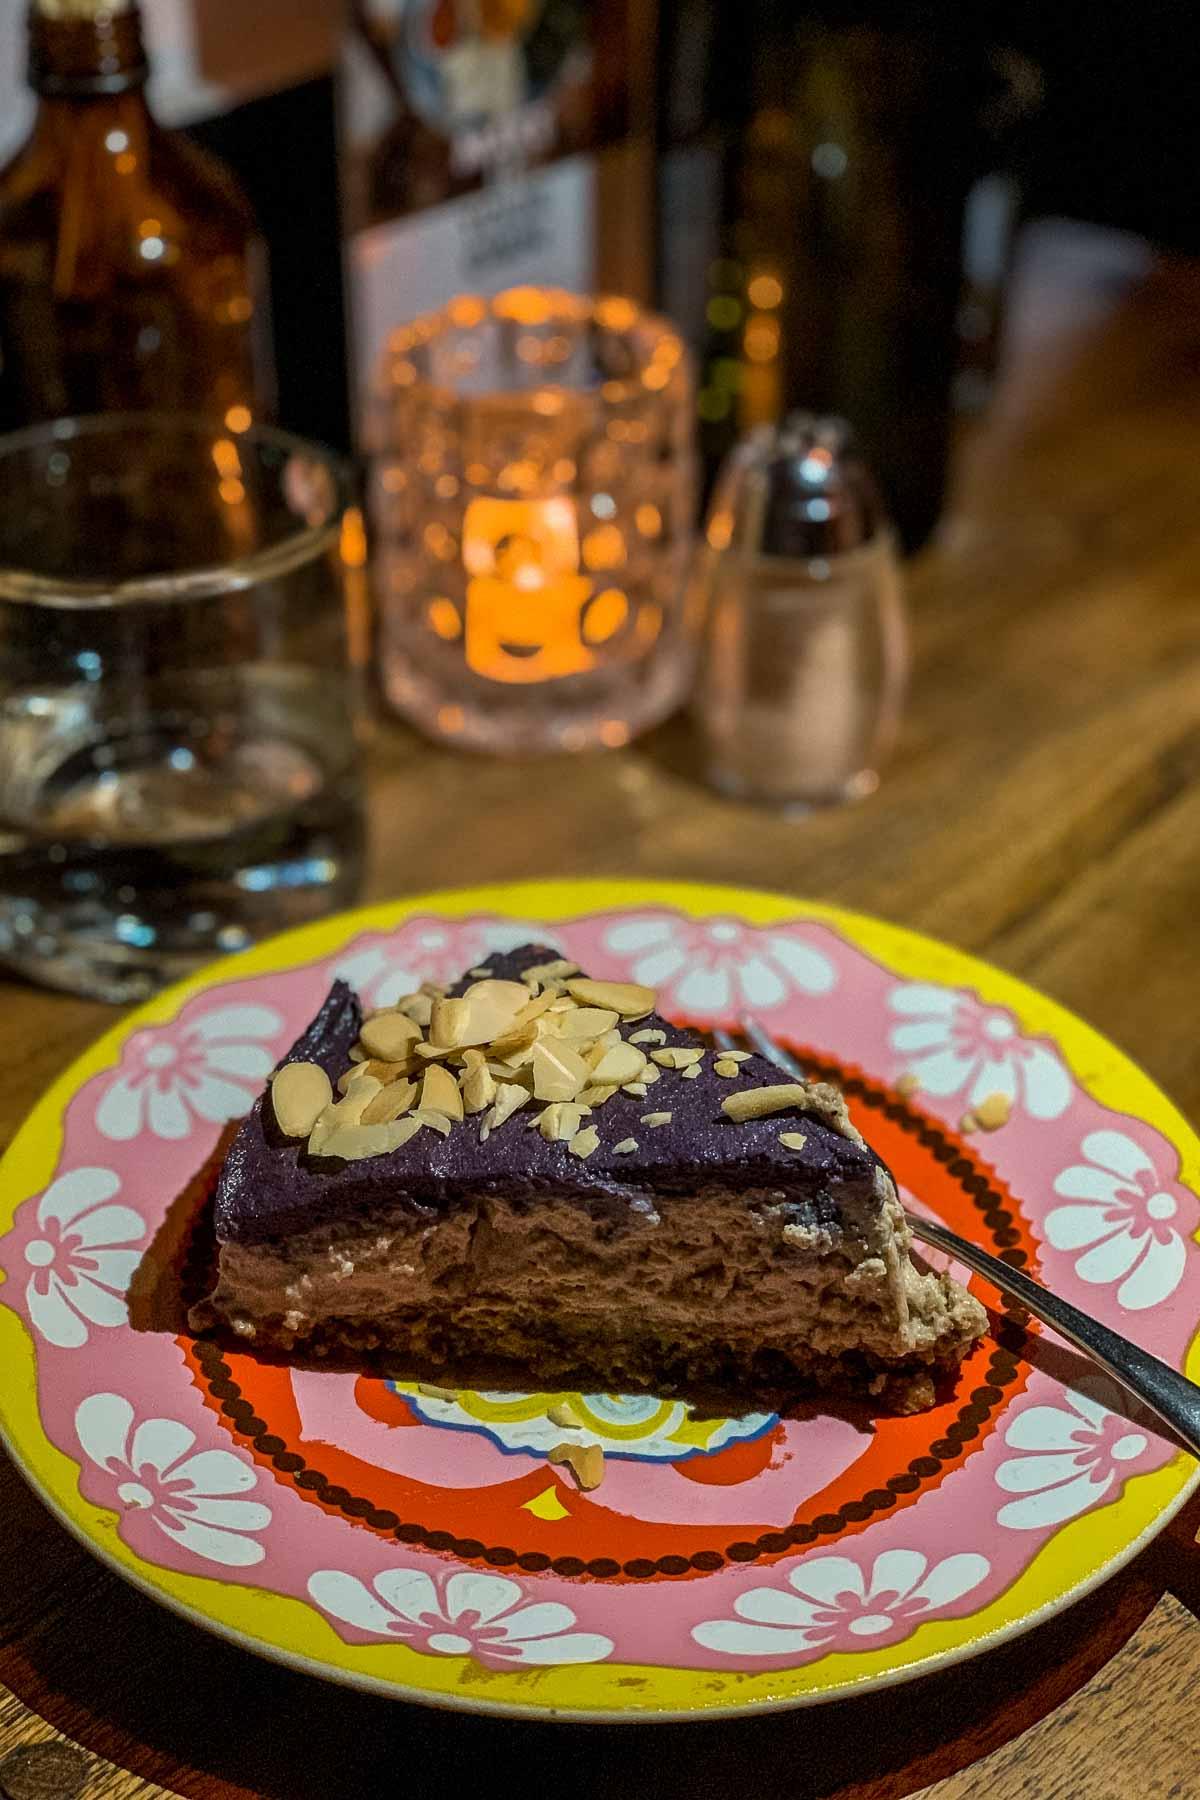 Healthy chocolate cake at Motion Cafe in Canggu, Bali